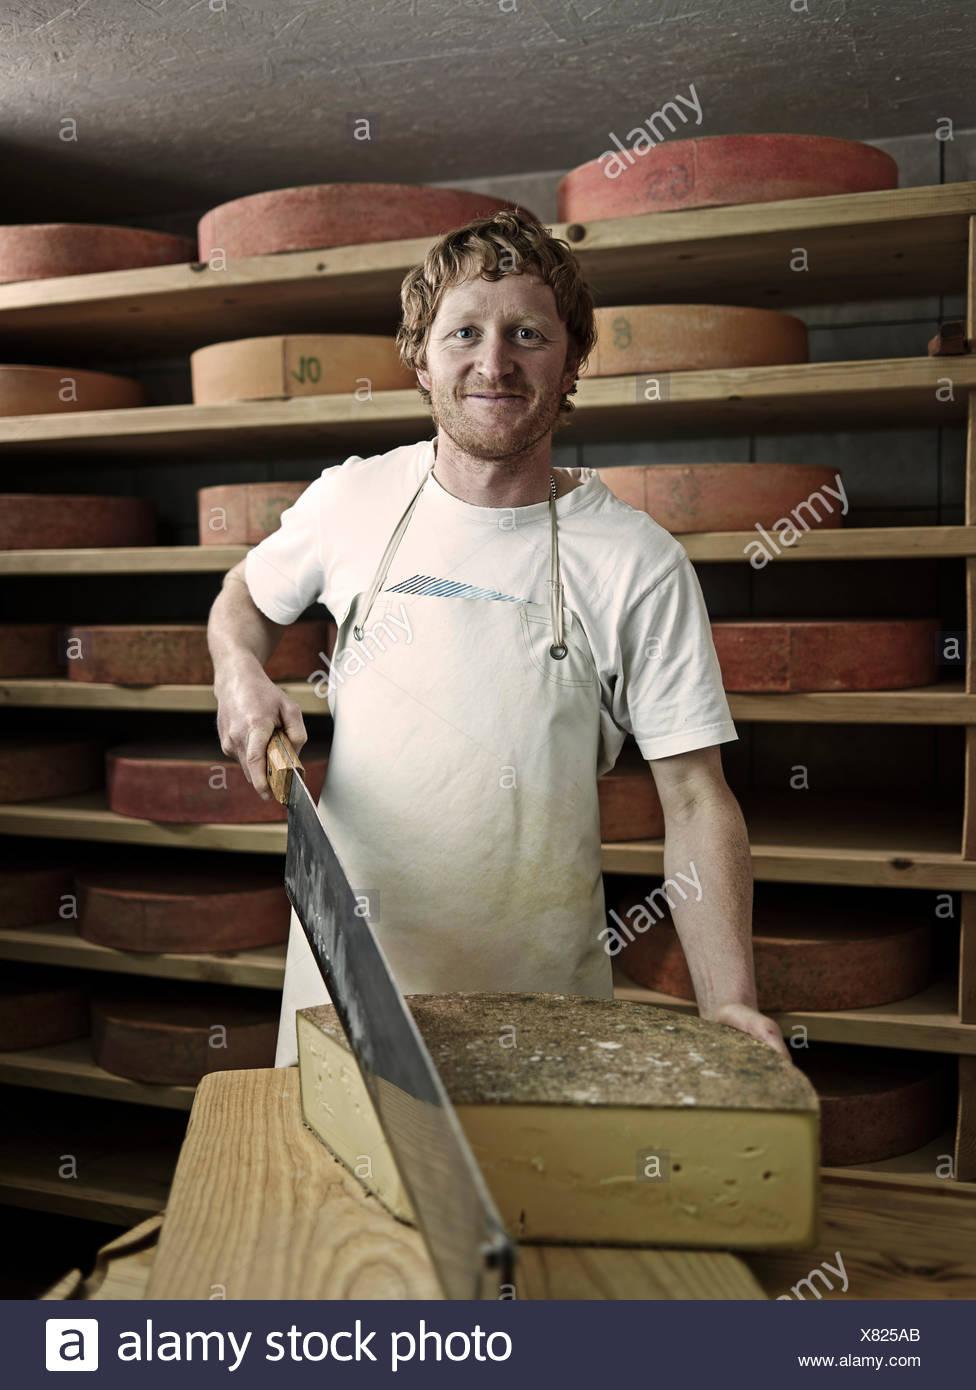 Dairyman cutting a mountain cheese, Steinbergalm, Inneralpbach, Alpbach, Tyrol, Austria - Stock Image